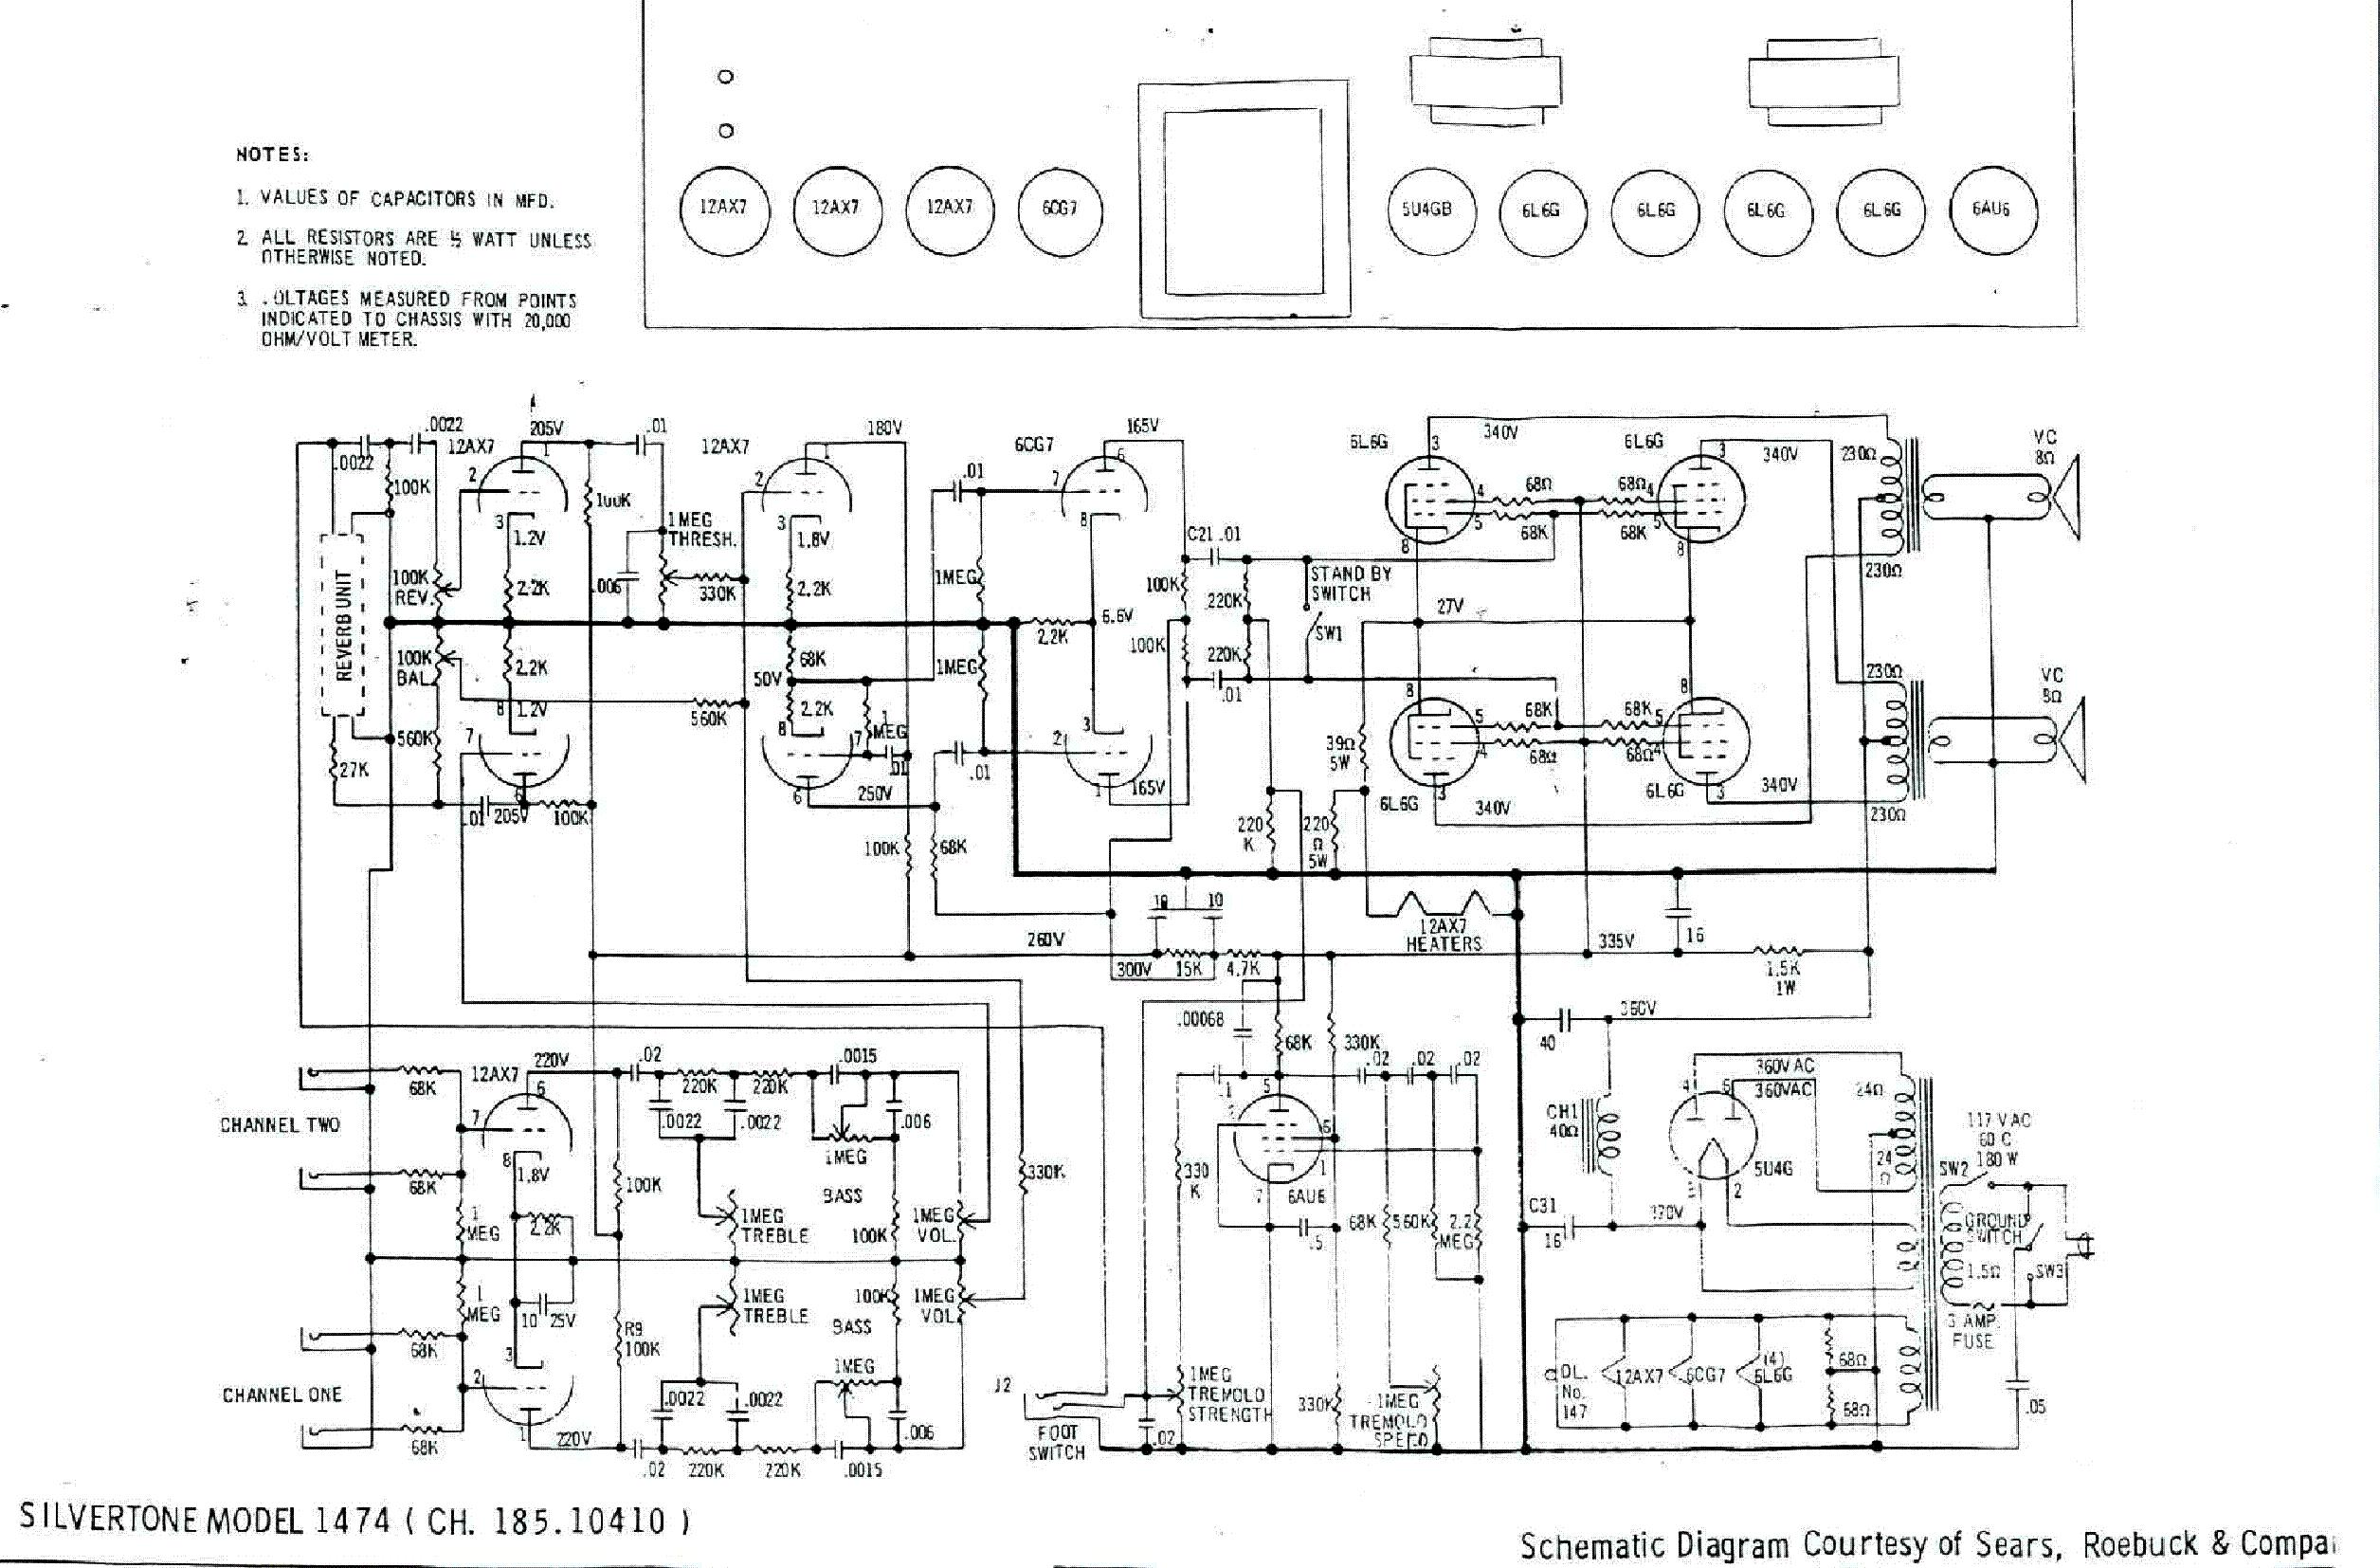 silvertone 1474 service manual schematics eeprom silvertone 1474 service manual 1st page